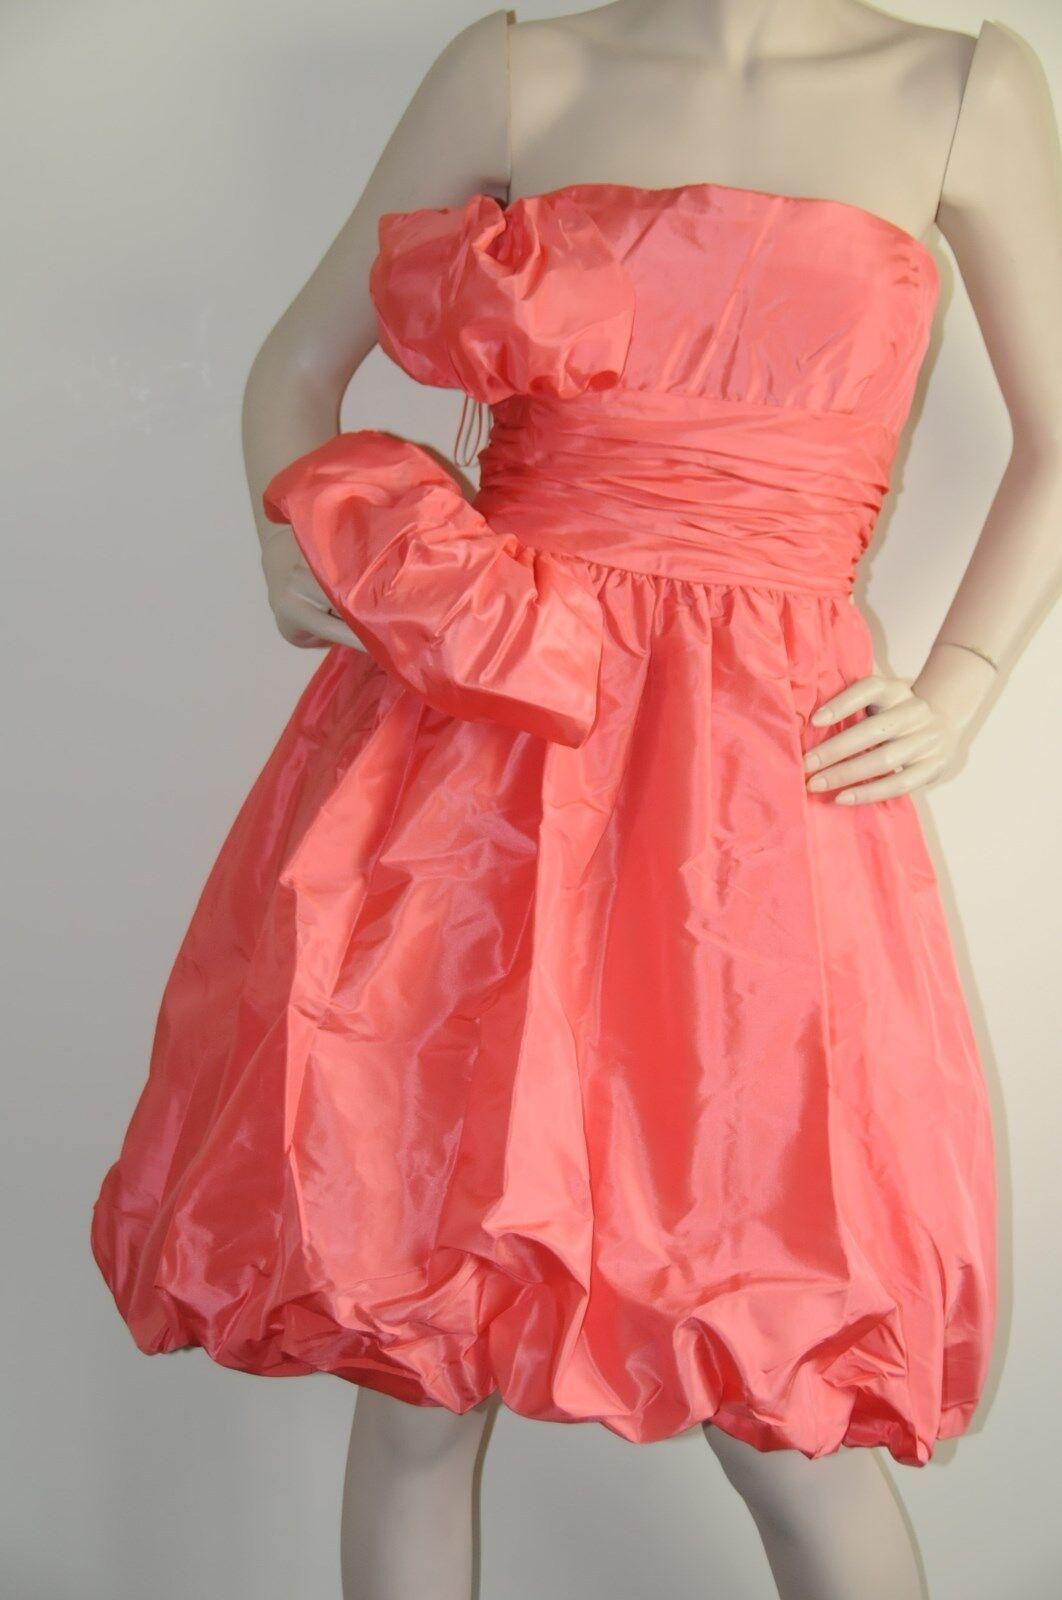 3290 New Oscar de la Renta Strapless Coral Silk Faille Taffeta Bubble DRESS 6